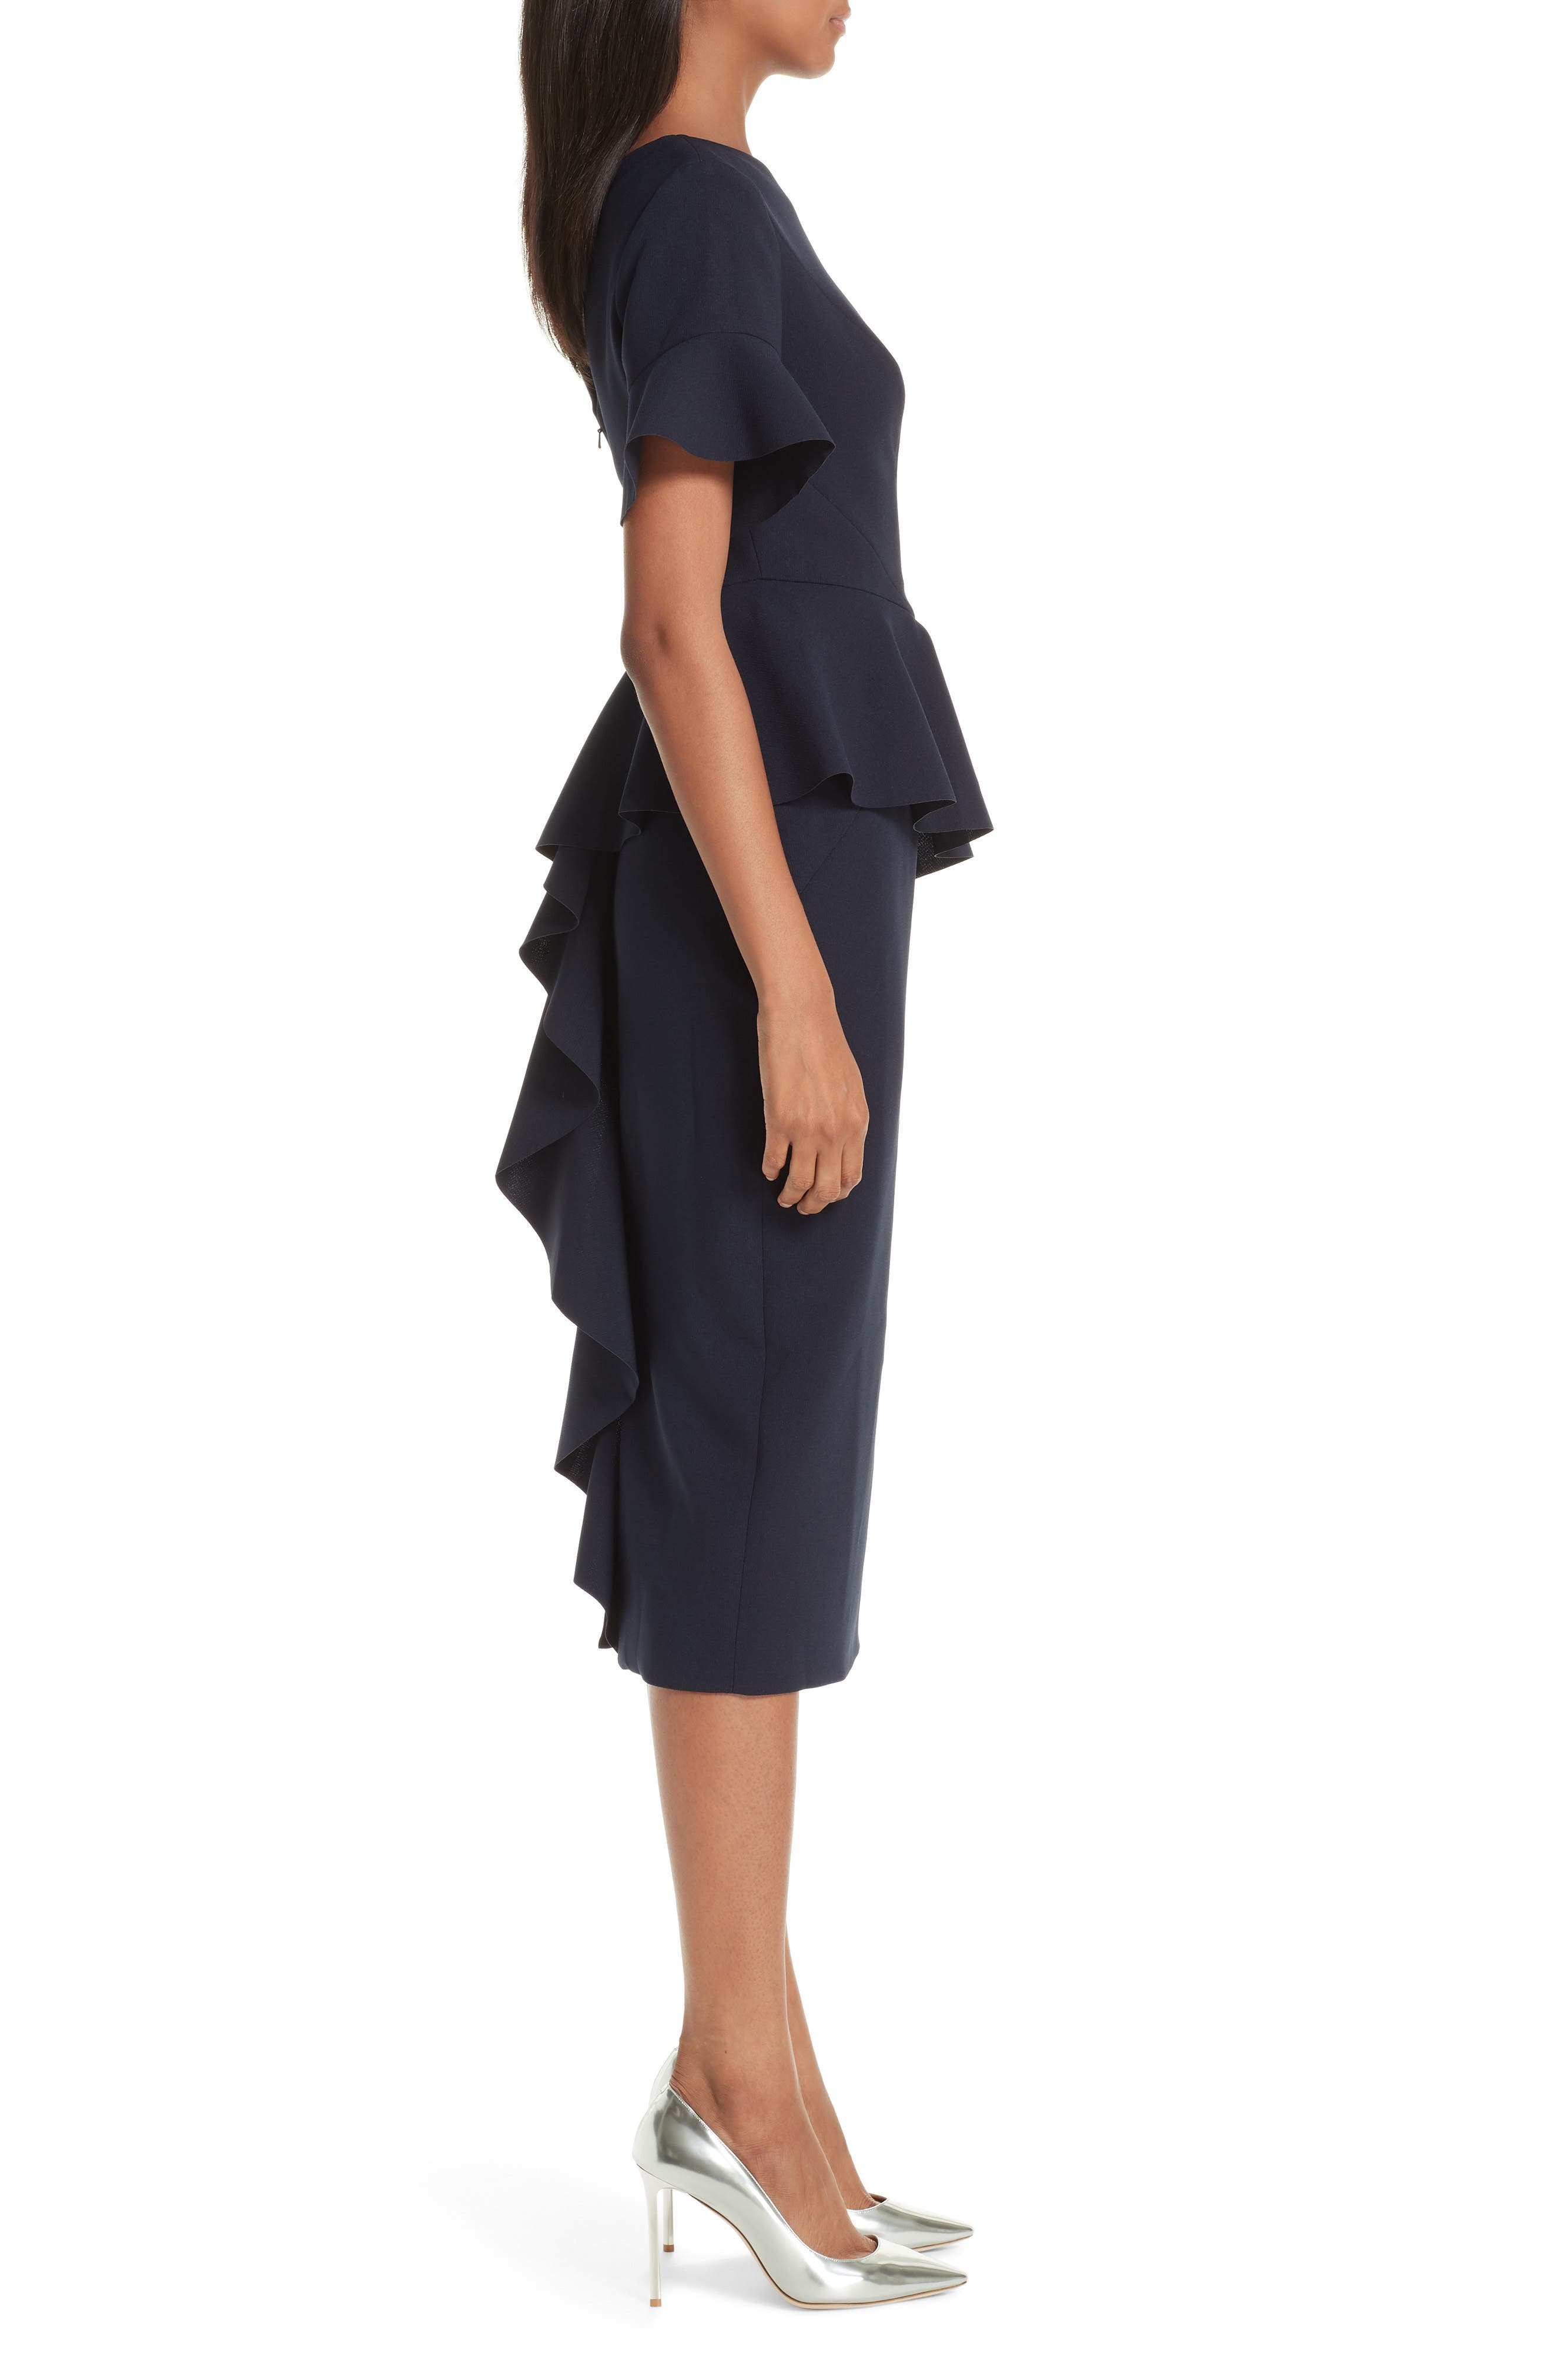 RACHEL GILBERT,                             Farah Peplum Dress,                             Alternate thumbnail 3, color,                             495